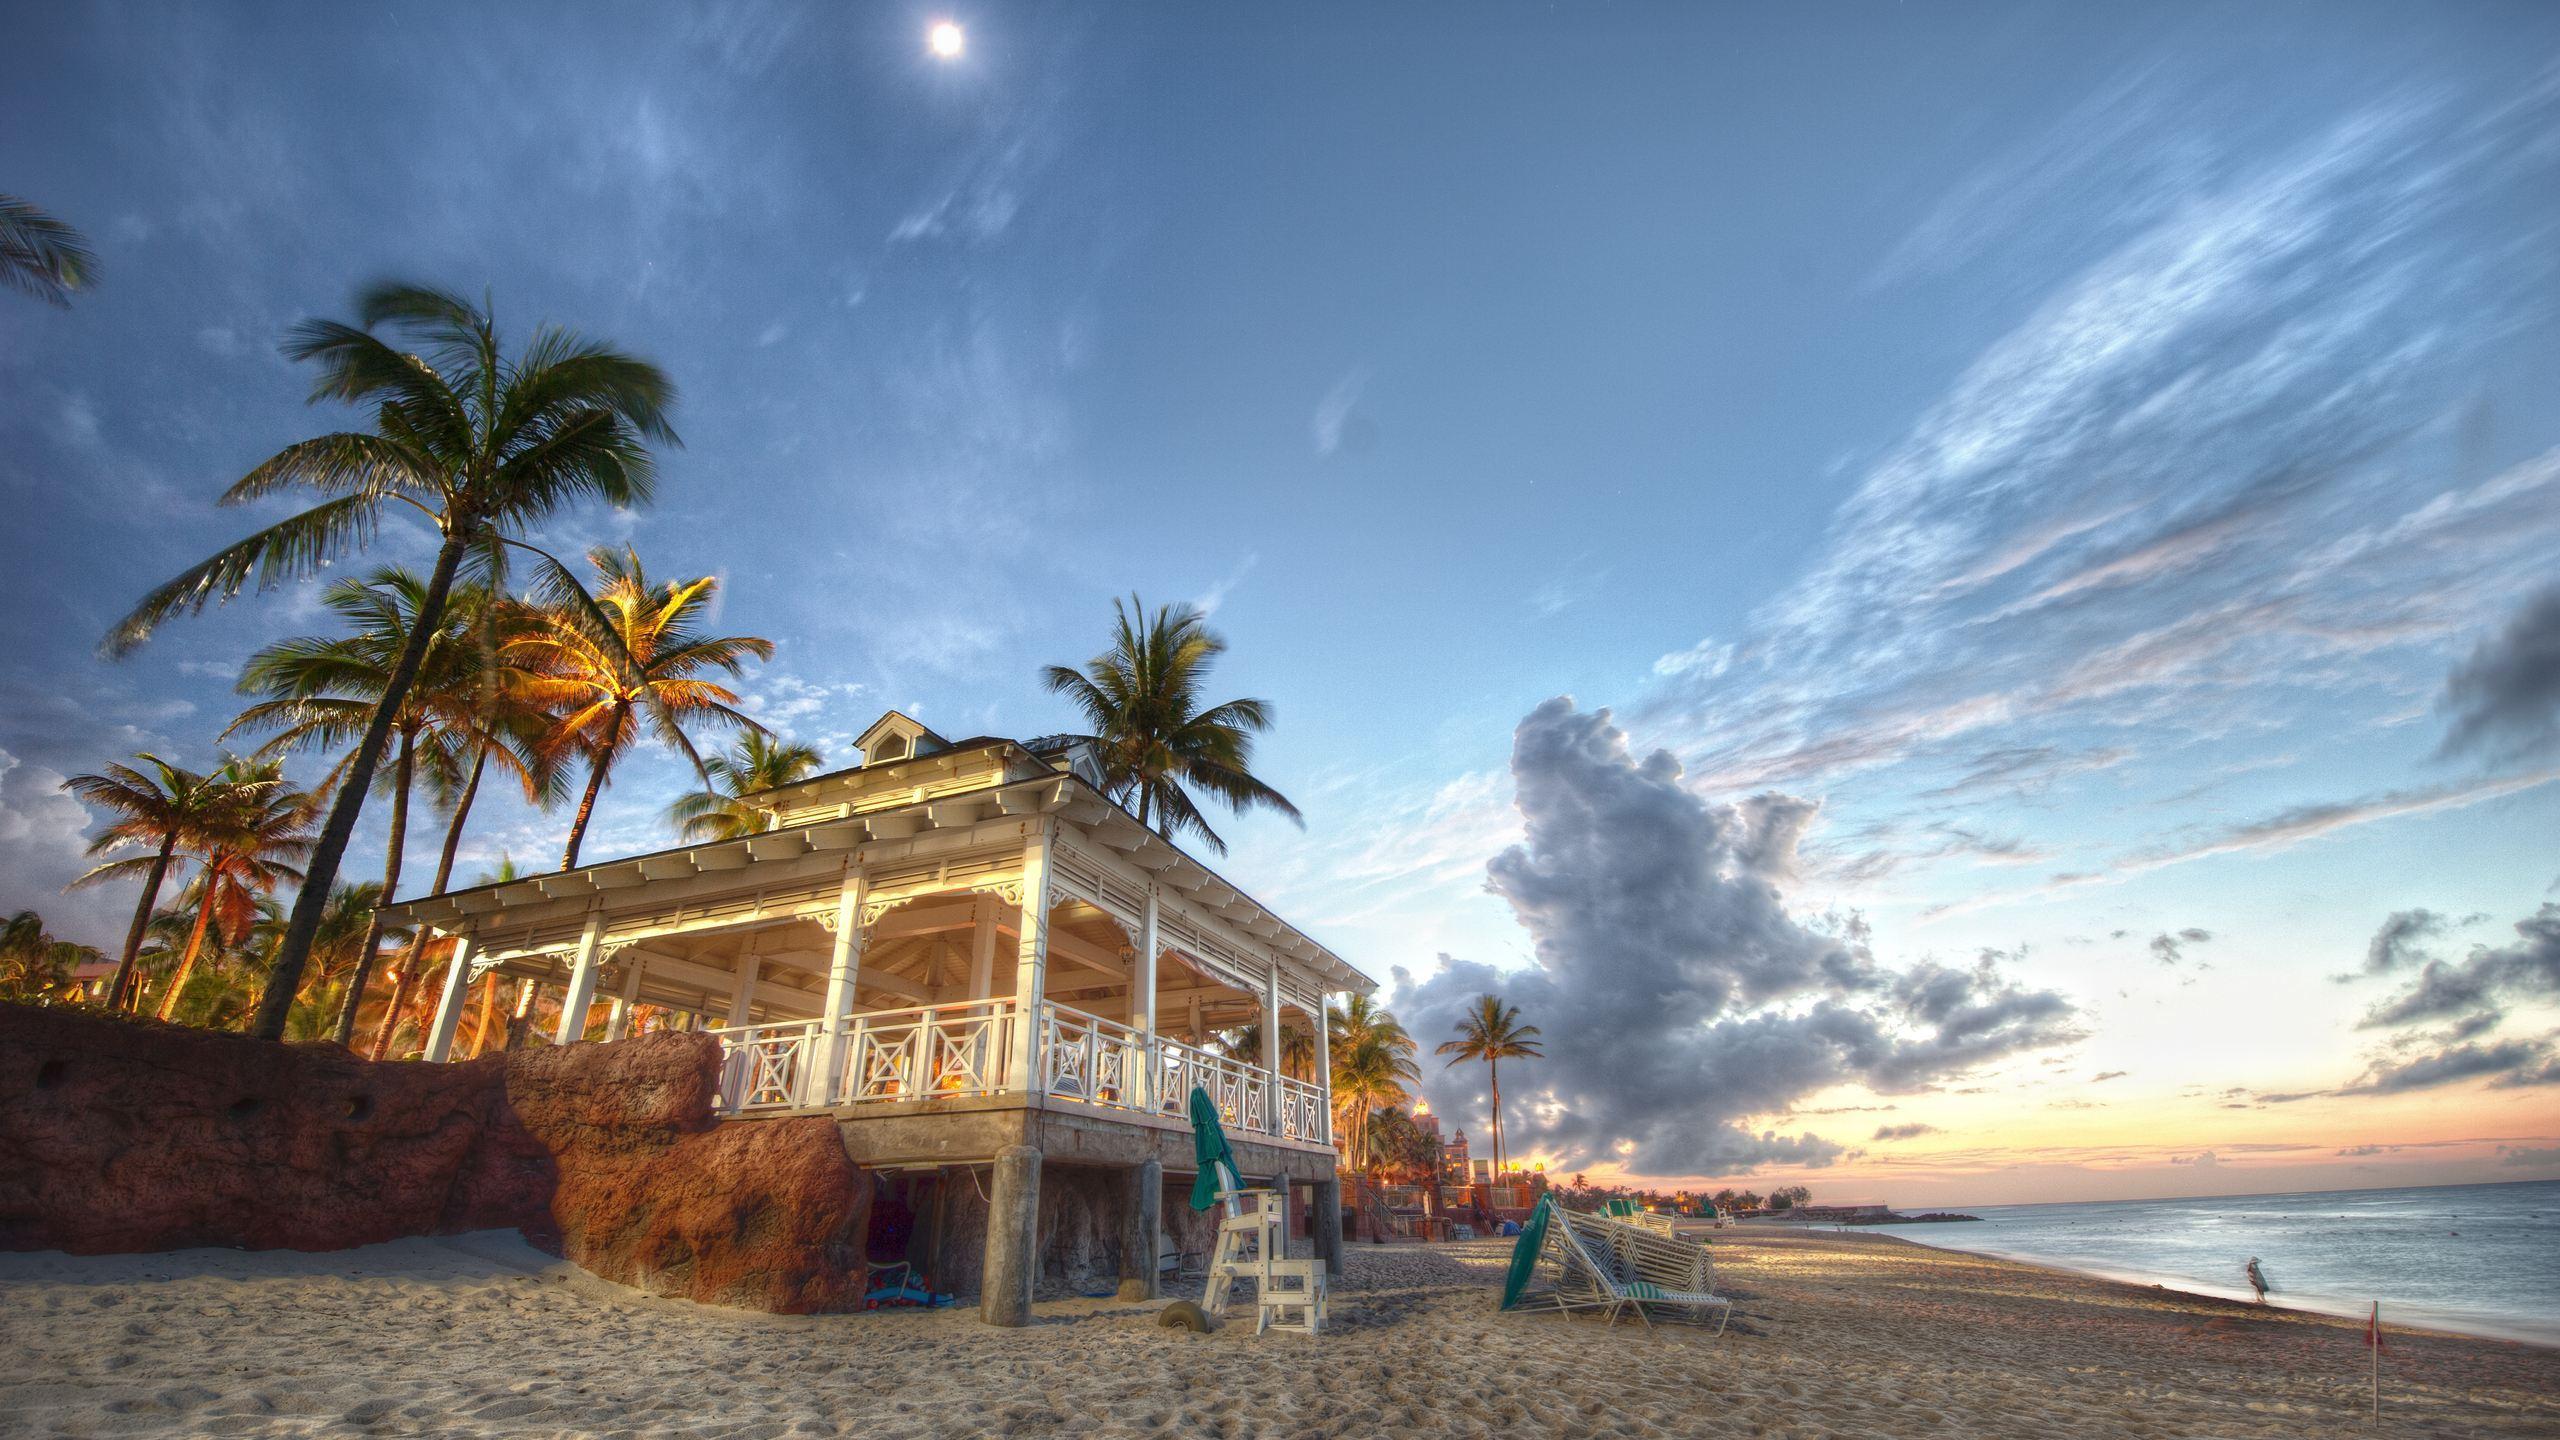 ac768ffeacf-bahamas-beach-nassau-bahamas-wallpaper-wp3601411